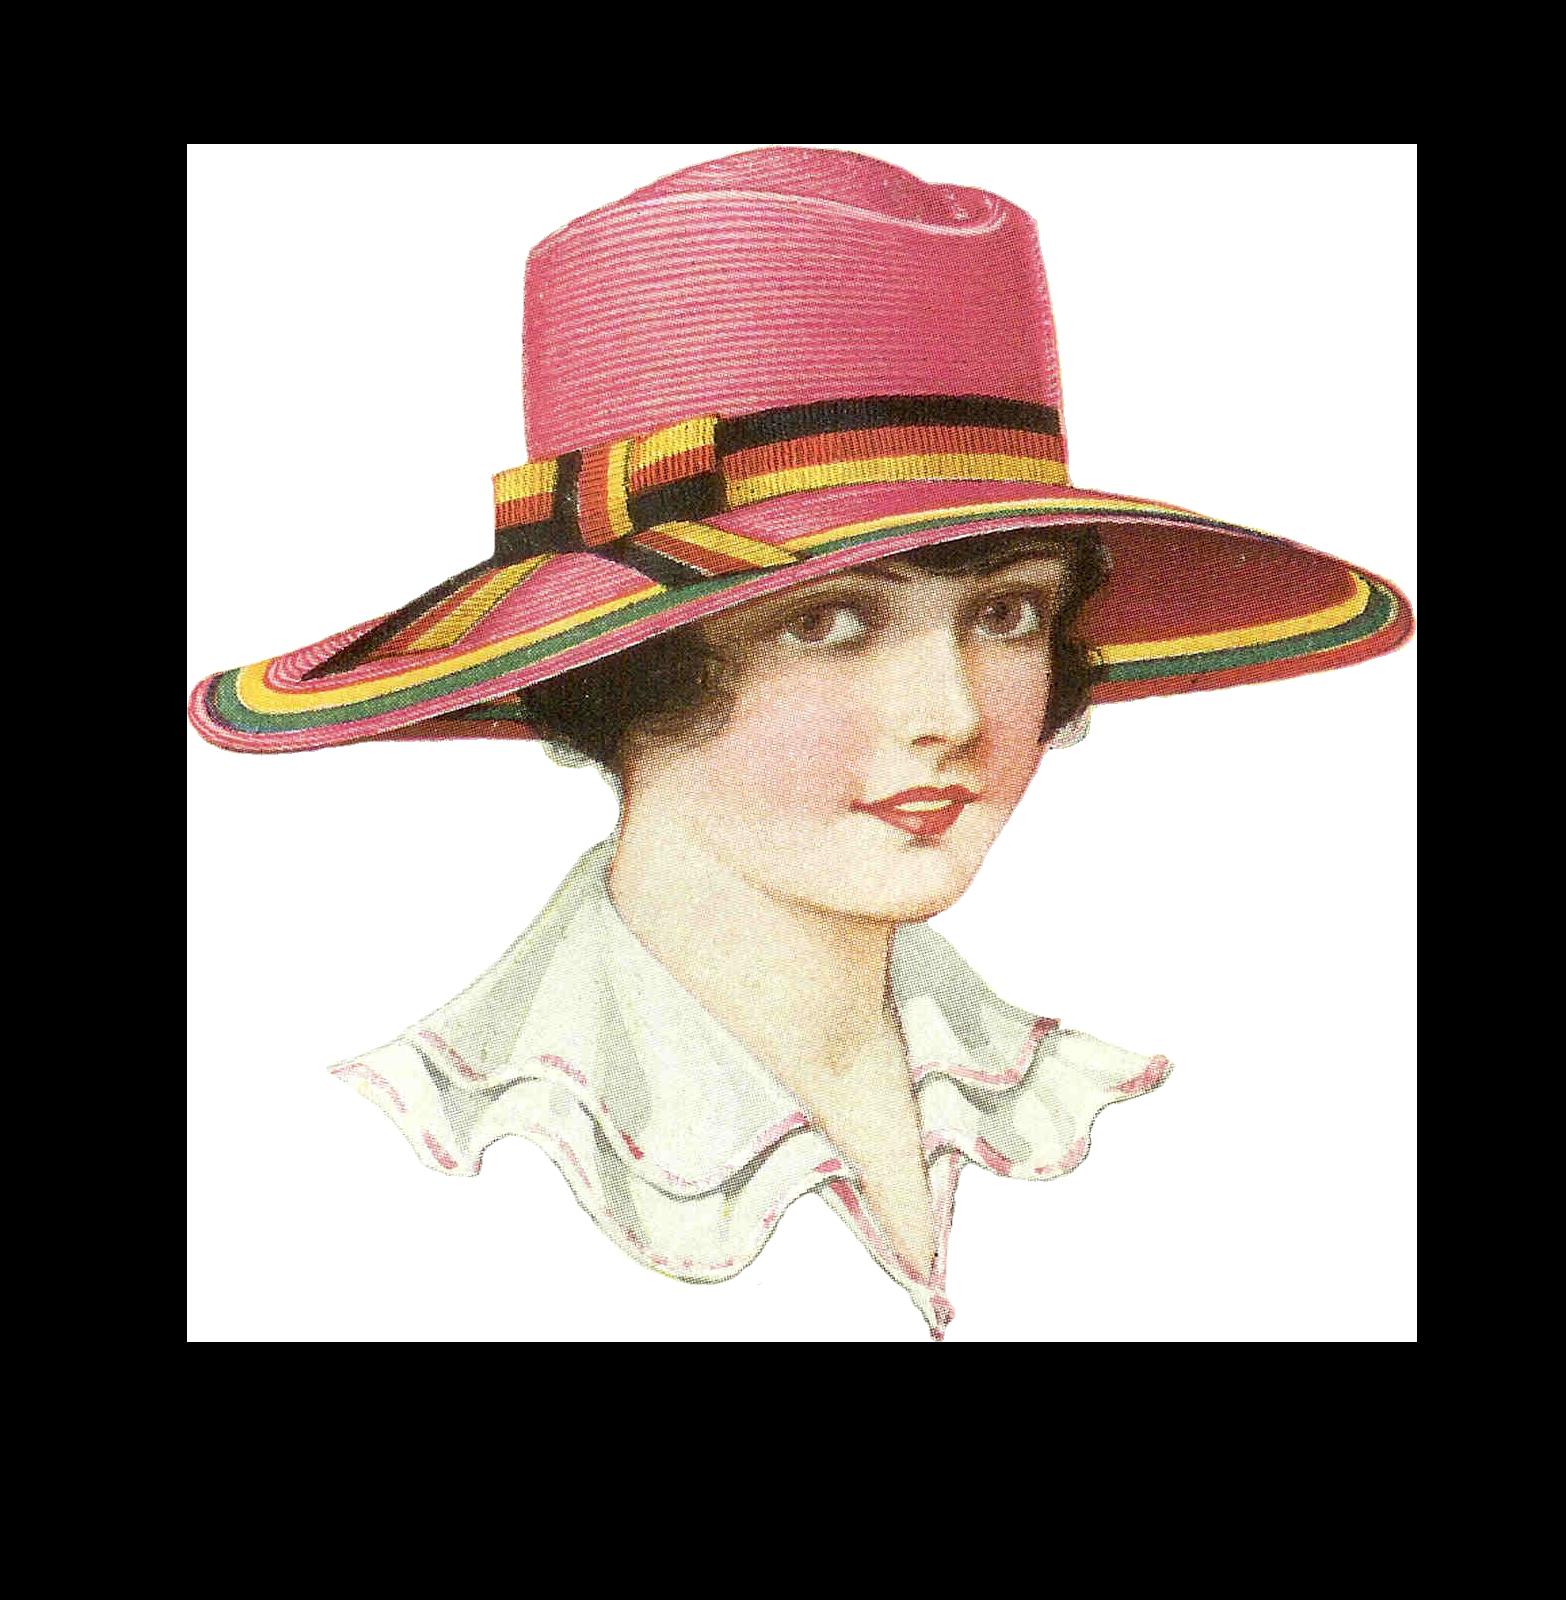 Clipart clothes women's clothing. Women s fashion hats